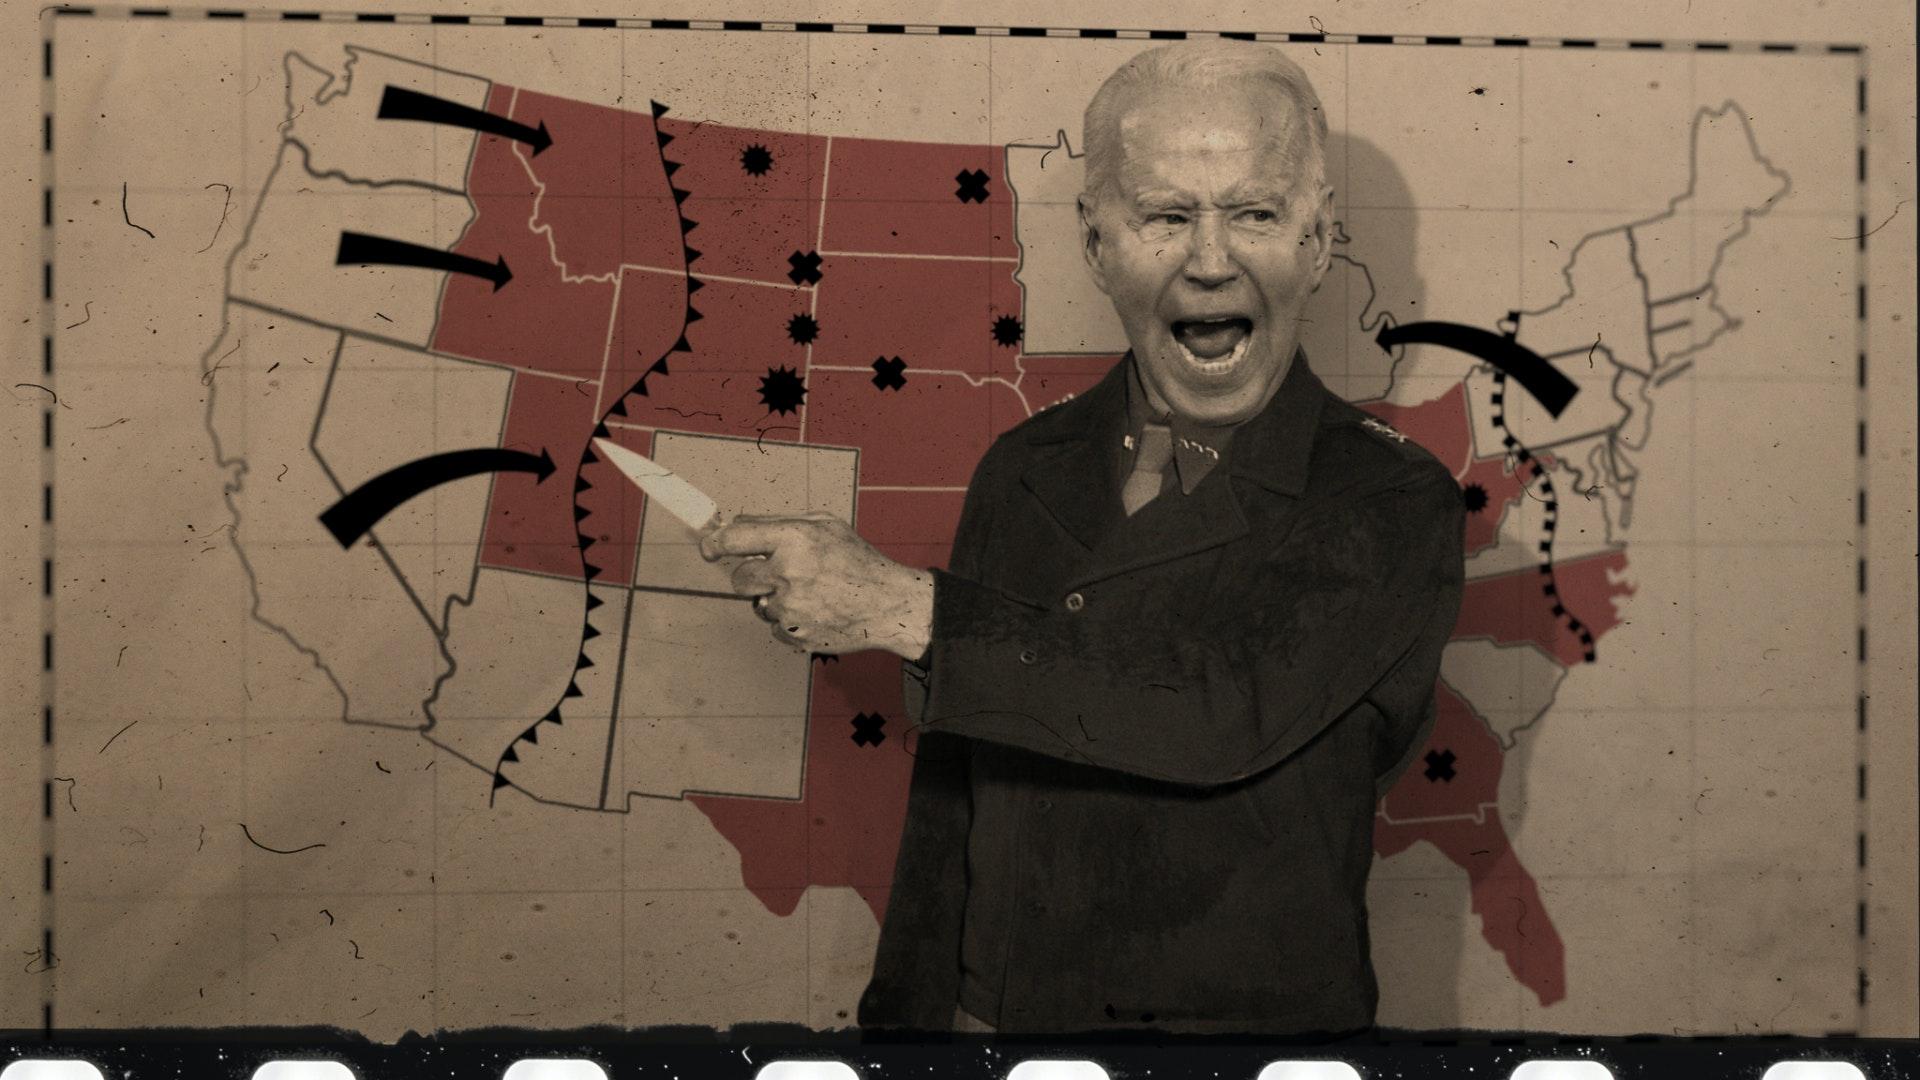 Ep. 1296 - Biden Declares Half The Country The Enemy